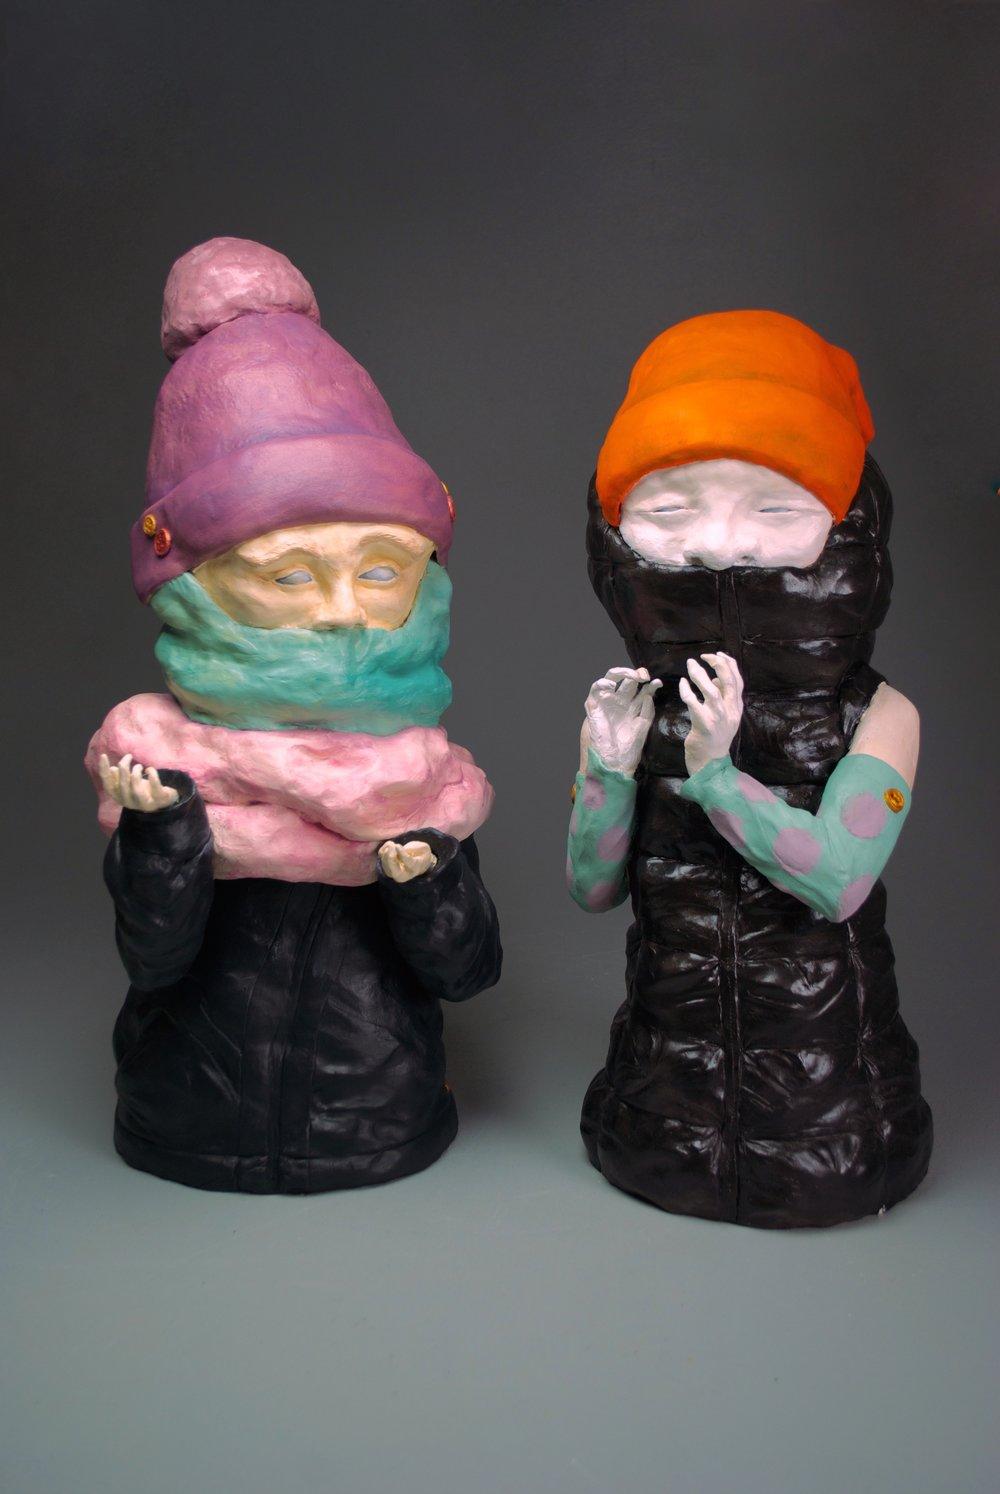 stephanie & valerie (sold pair)